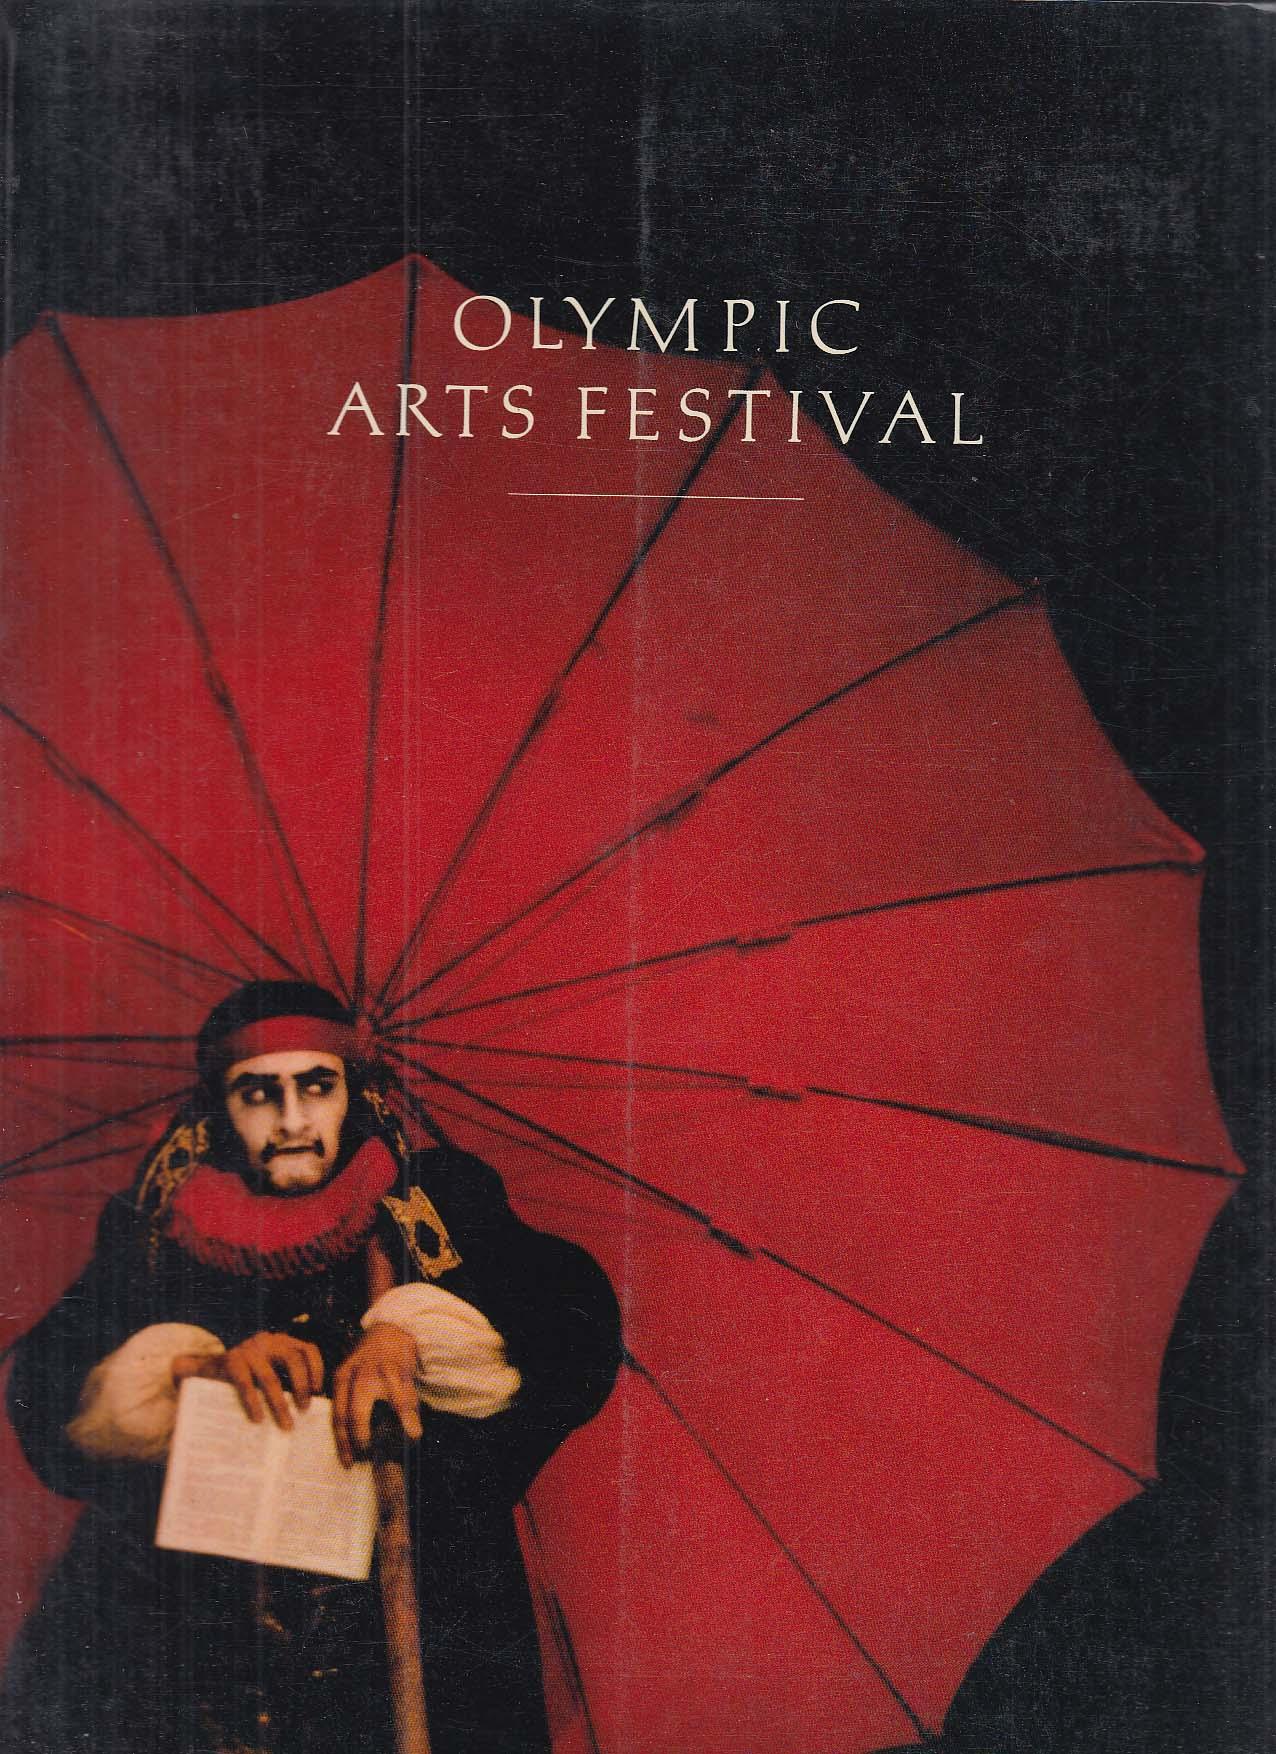 1984 Olympic Arts Festival souvenir book